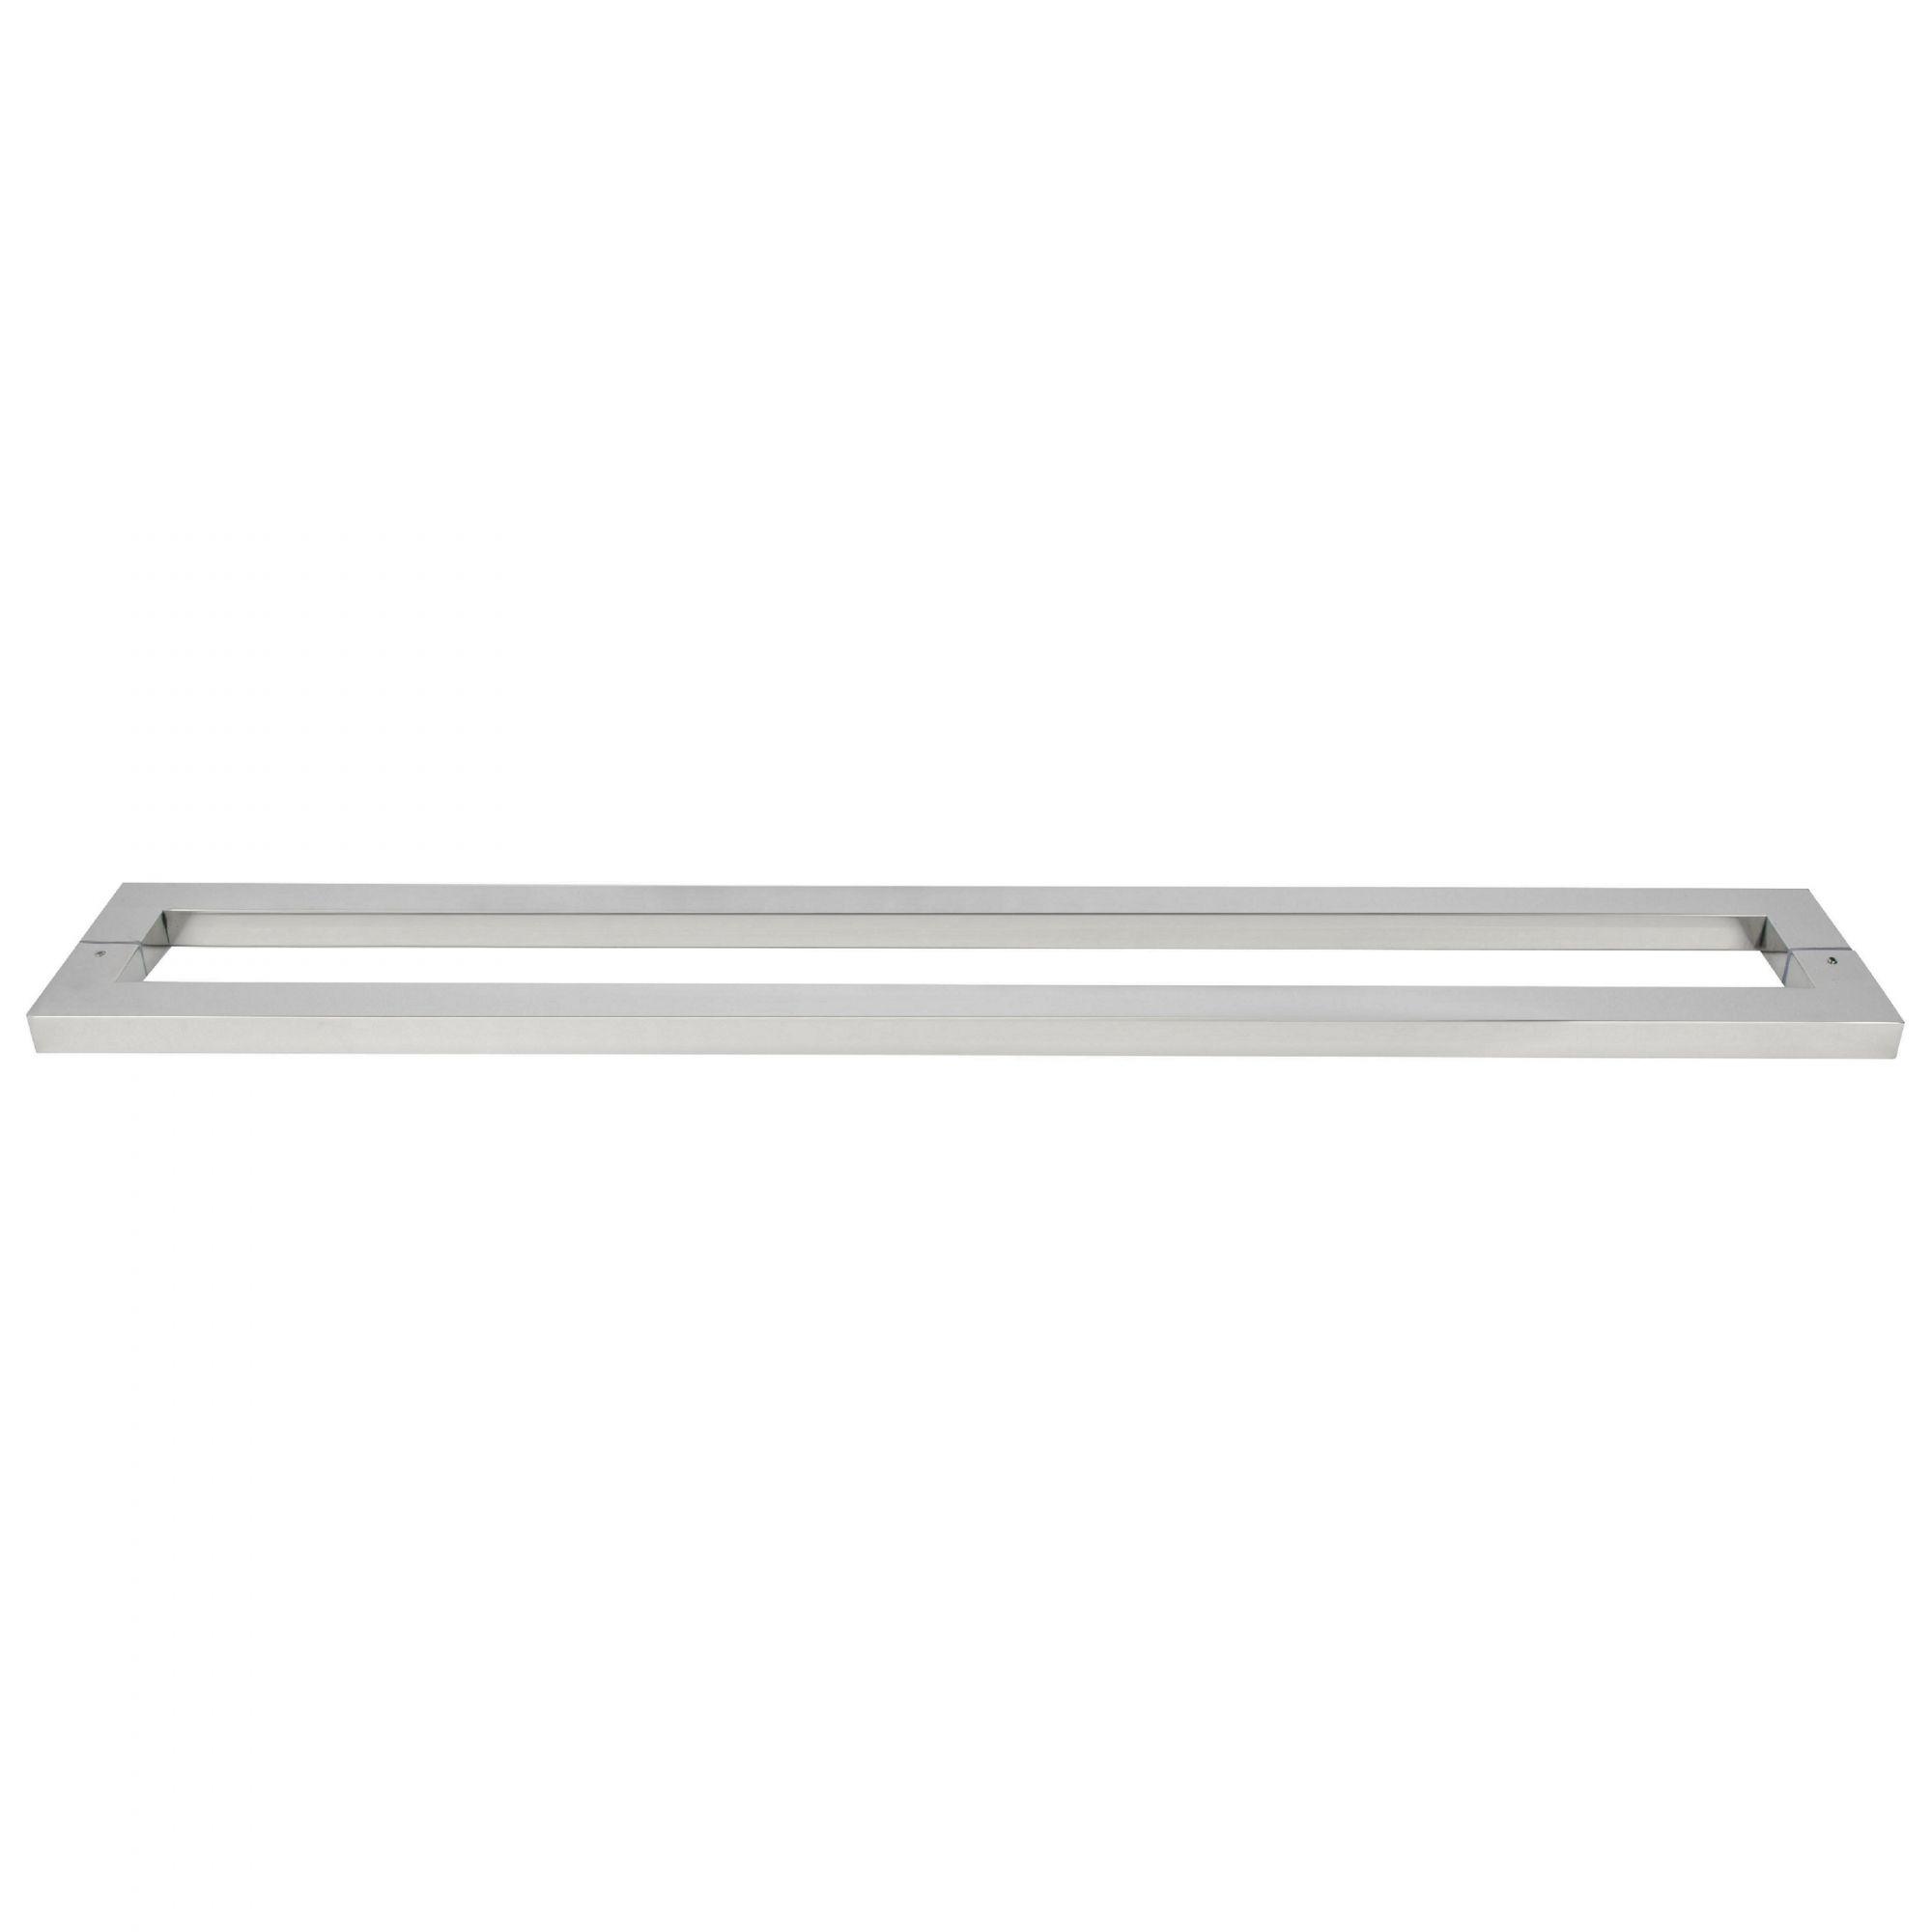 Puxador inox para porta madeira e vidro retangular barra chata 1,20m H12